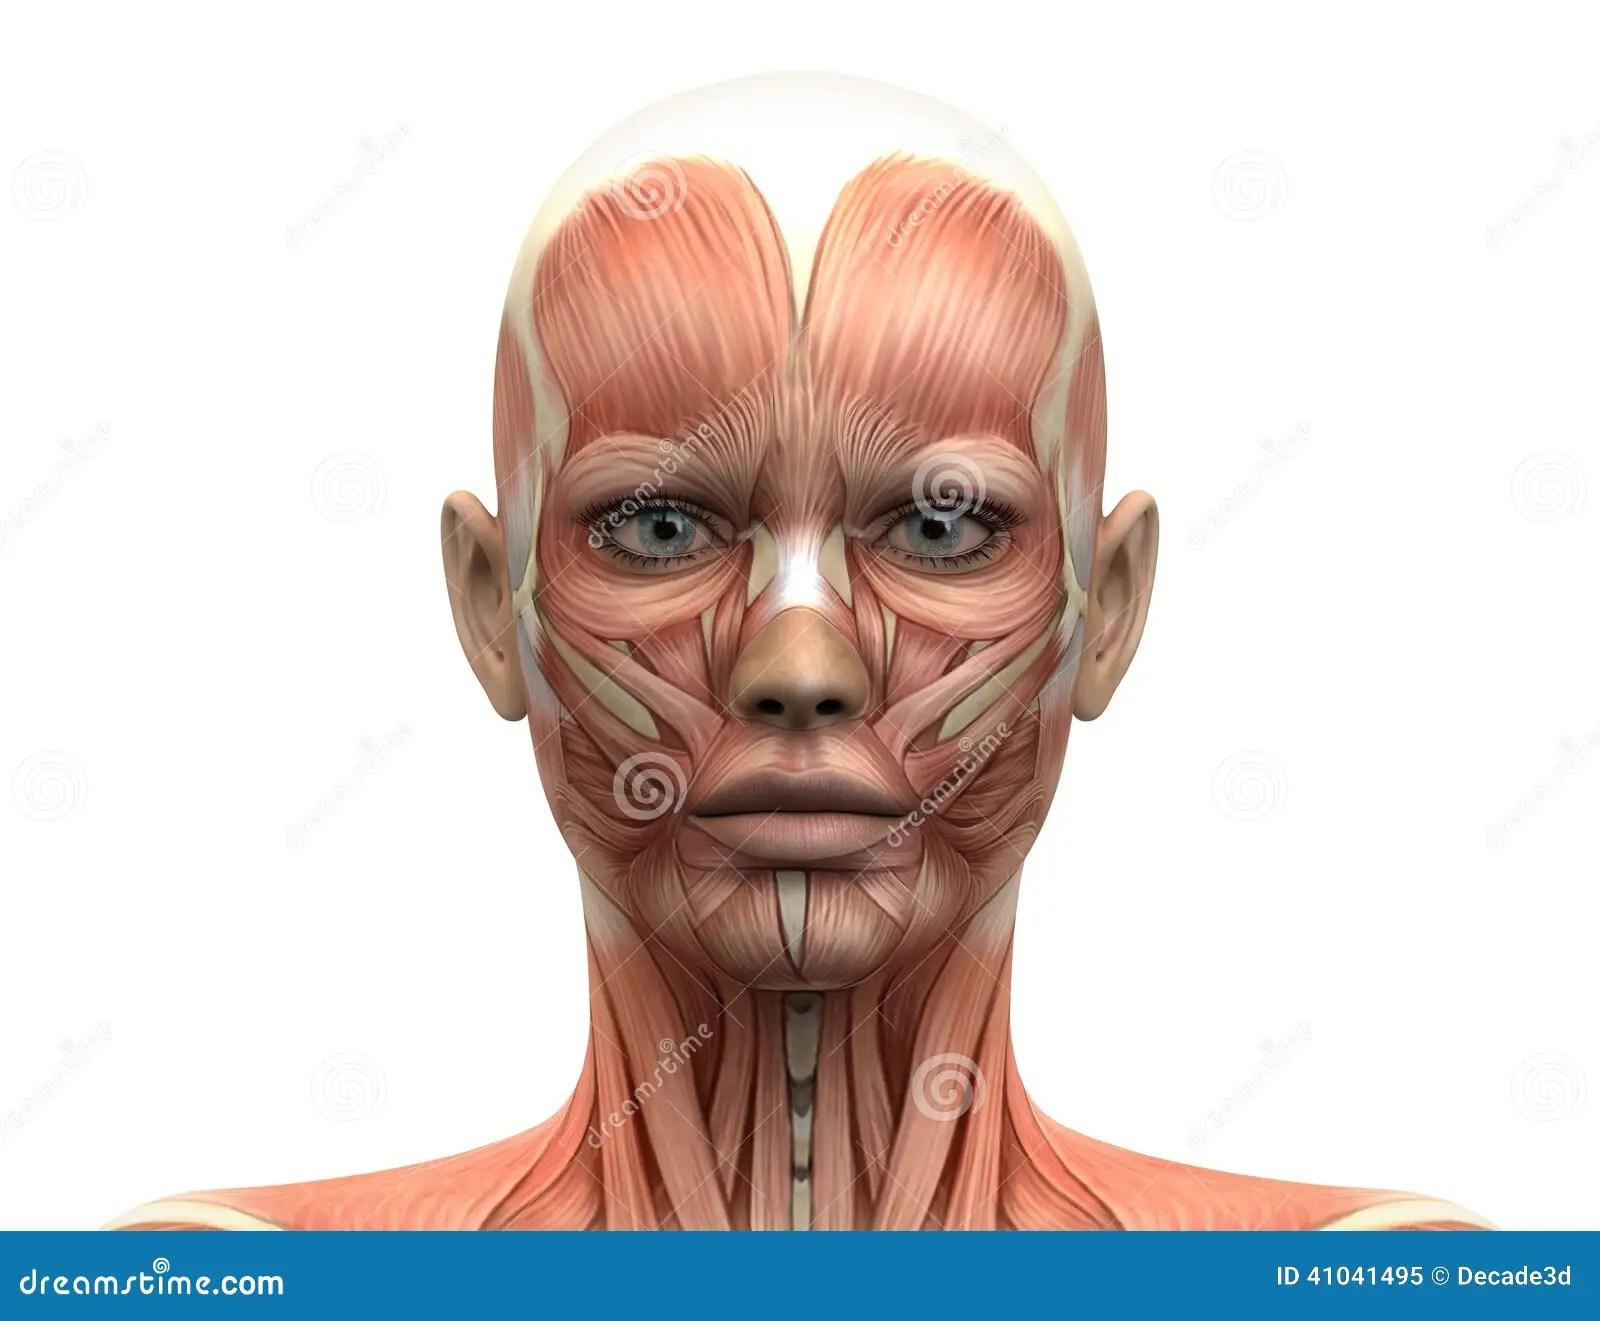 Female Head Muscles Anatomy